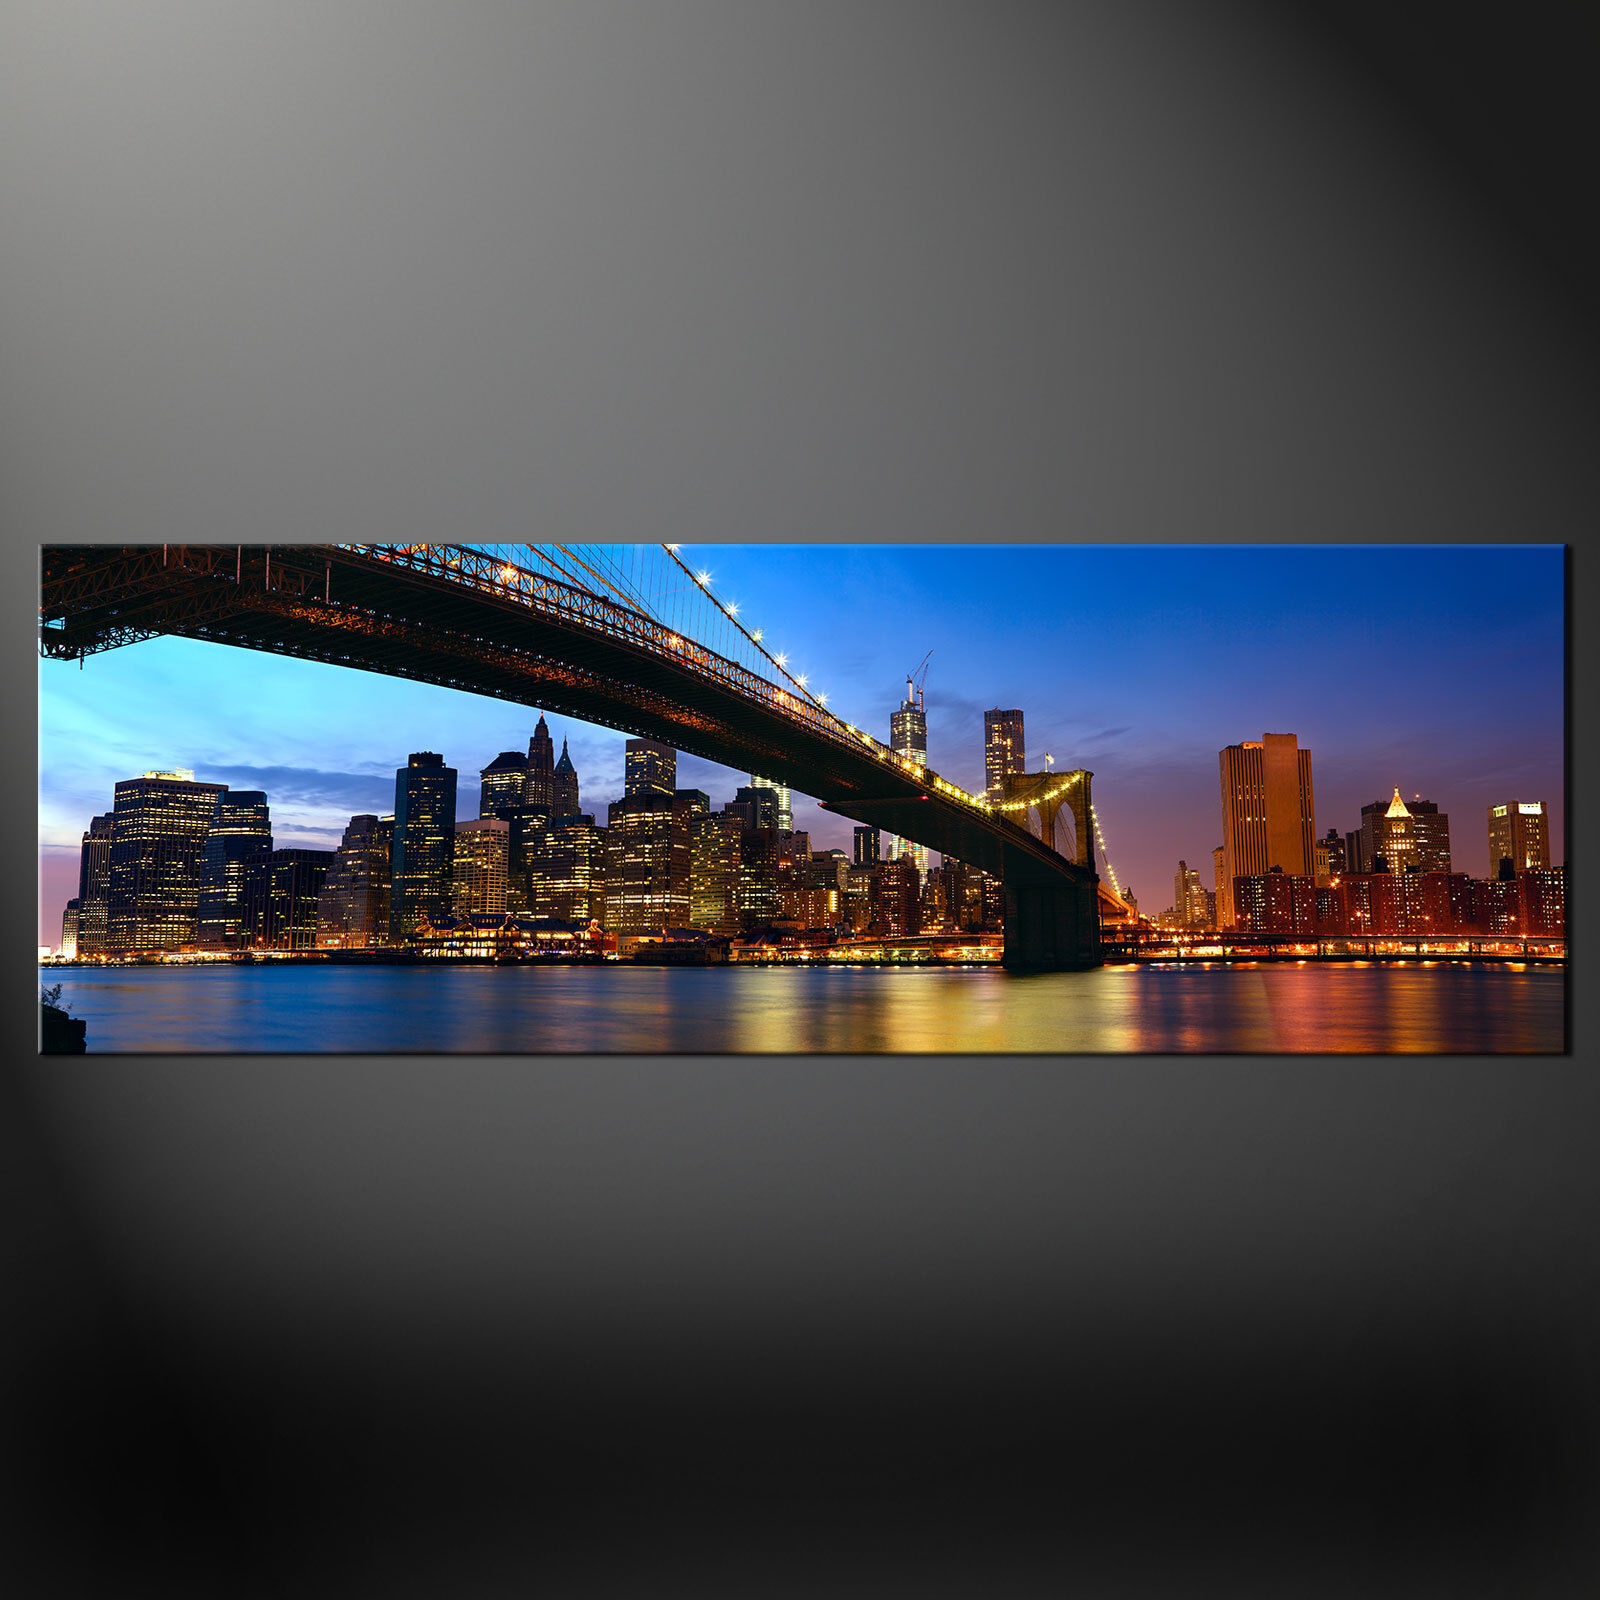 BROOKLYN BRIDGE SKYLINE NIGHT MODERN CANVAS PRINT WALL ART PICTURE READY TO HANG